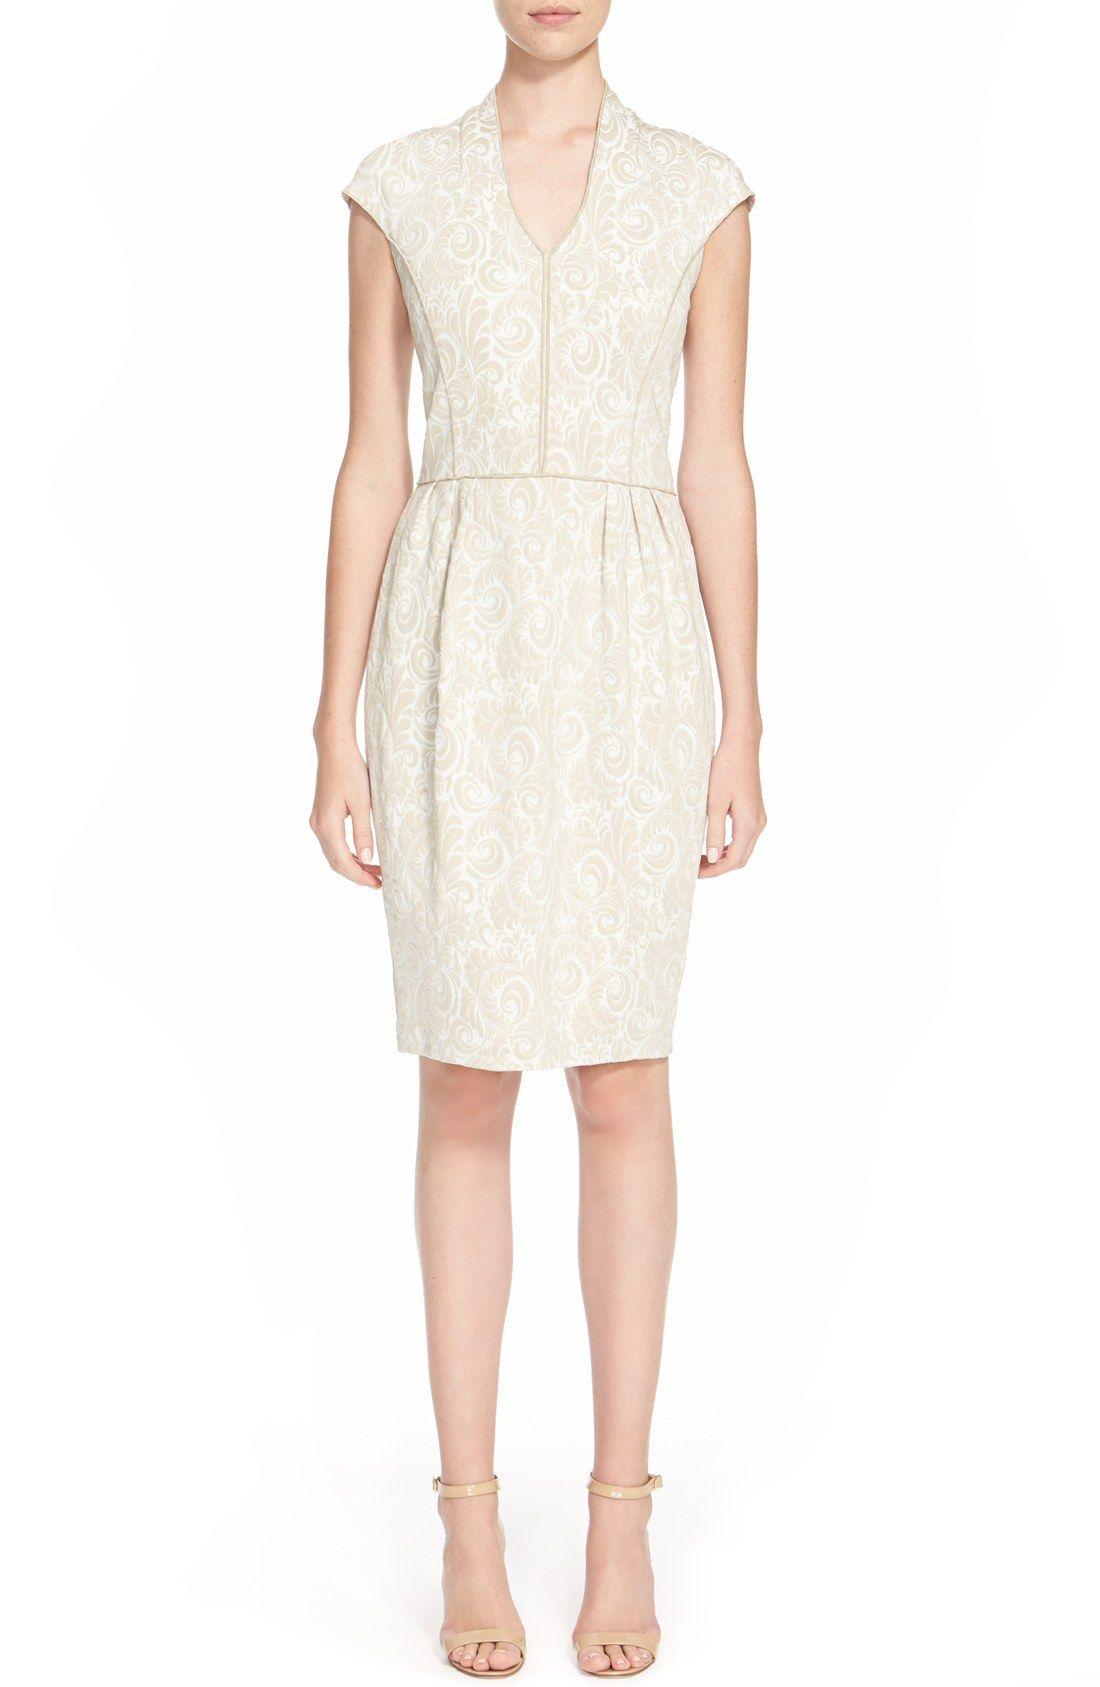 b4658f77ccef St. John Collection  Sophia  Jacquard Knit Dress